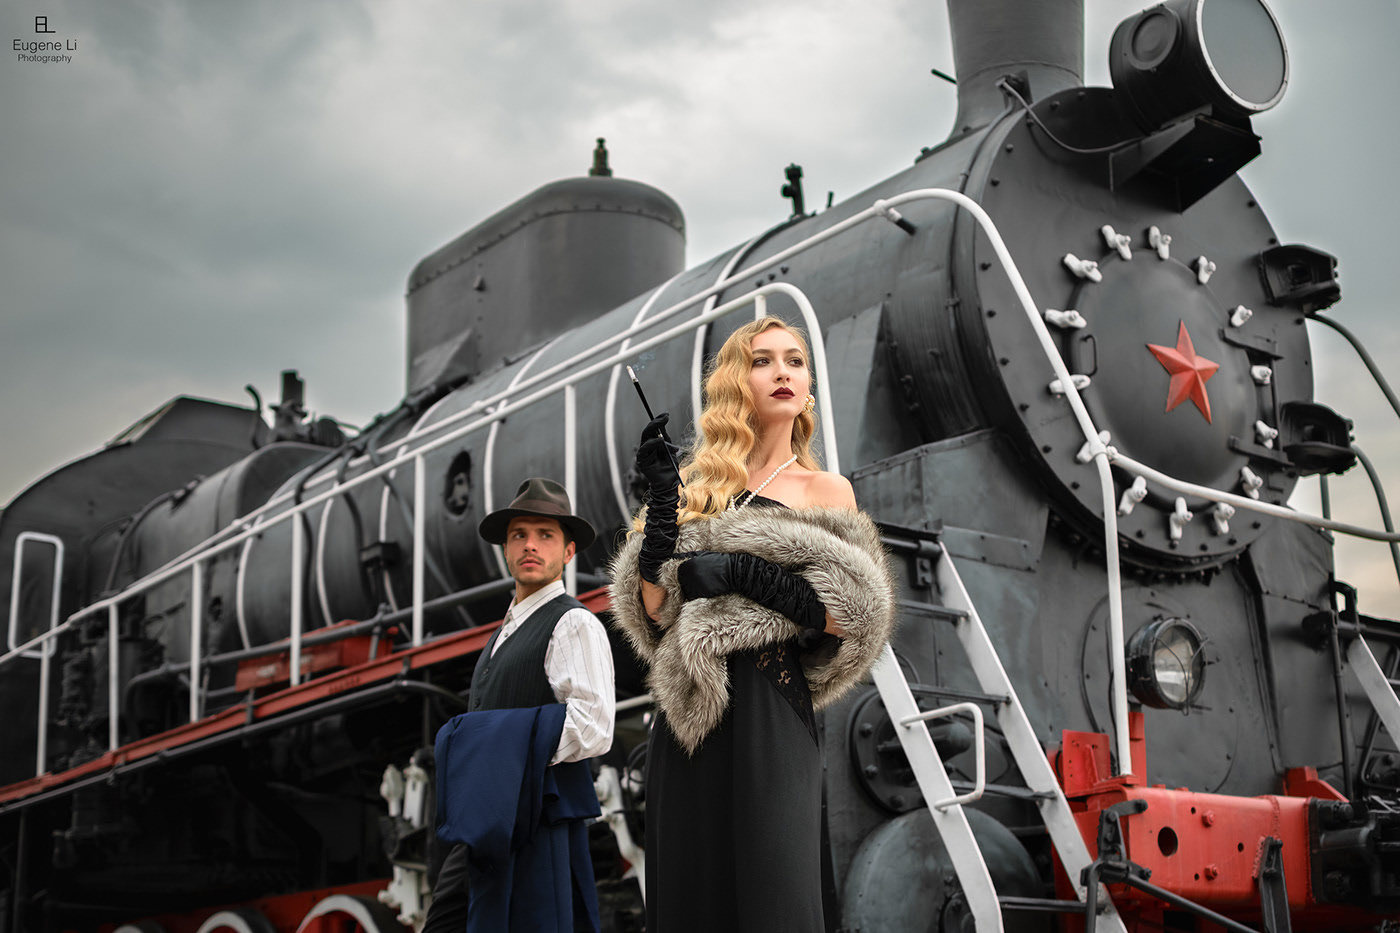 Railway Story / фото Eugene Li